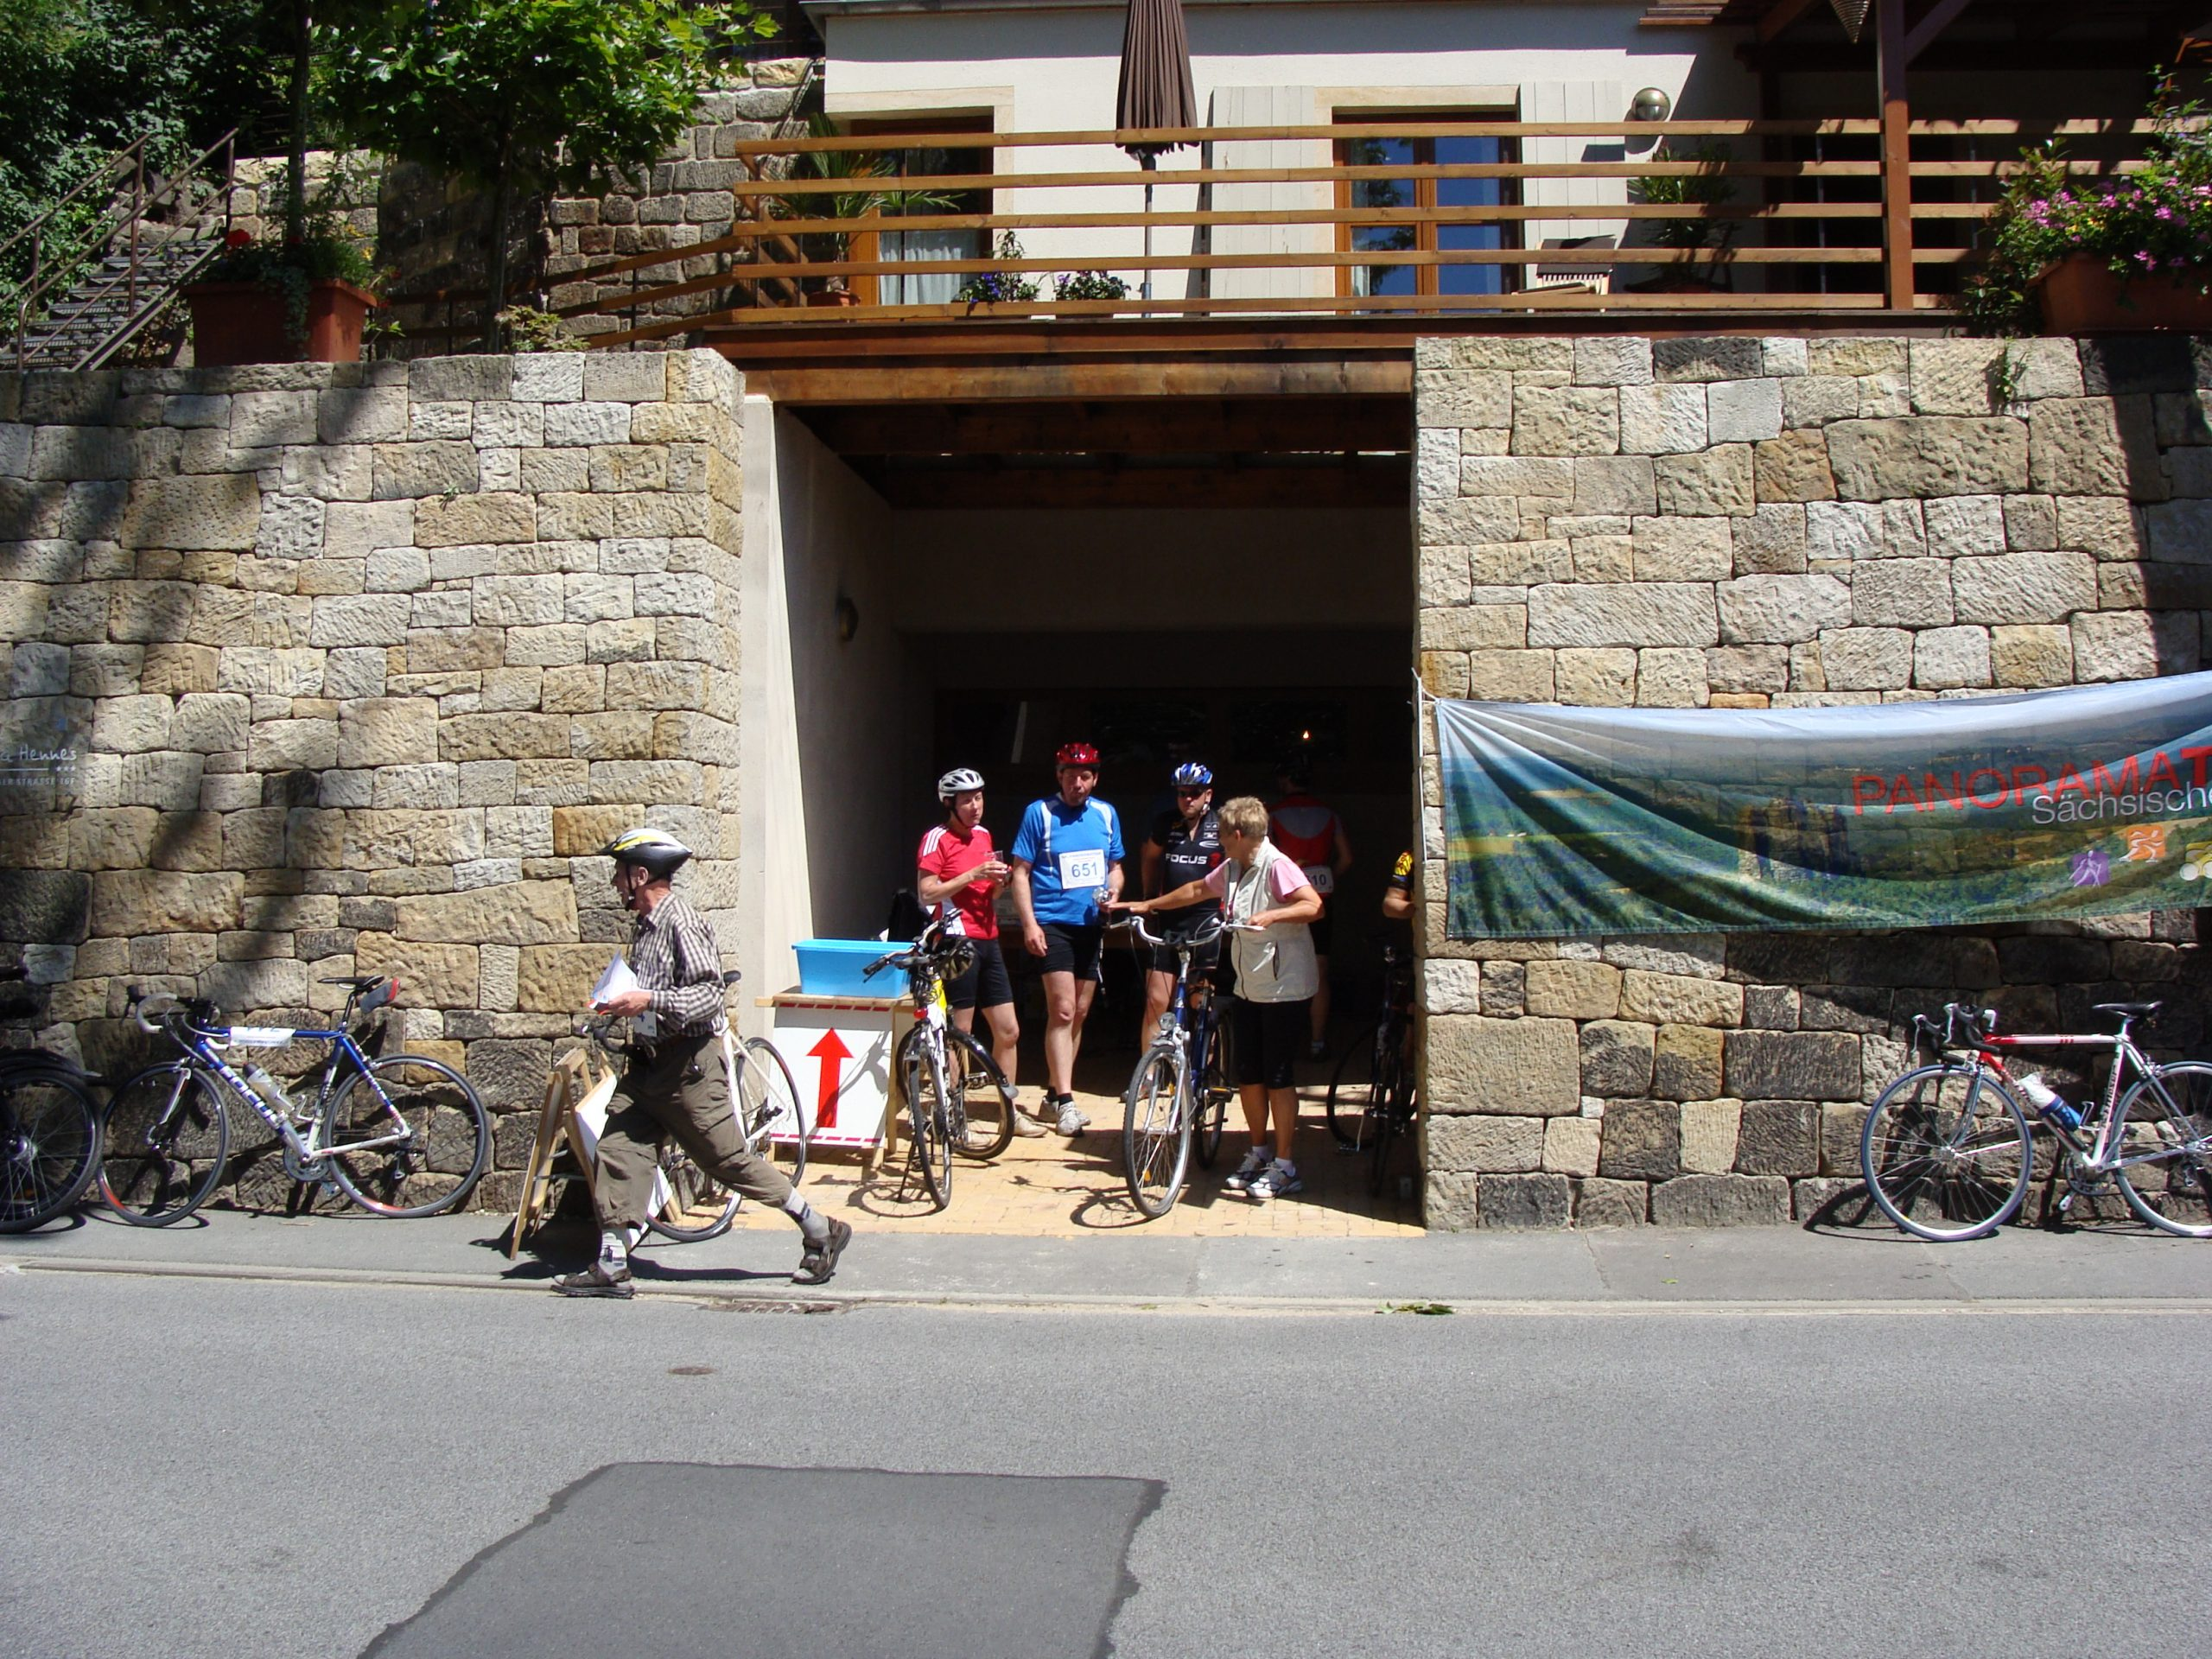 Radverpflegungspunkt Villa Hennes in Pirna